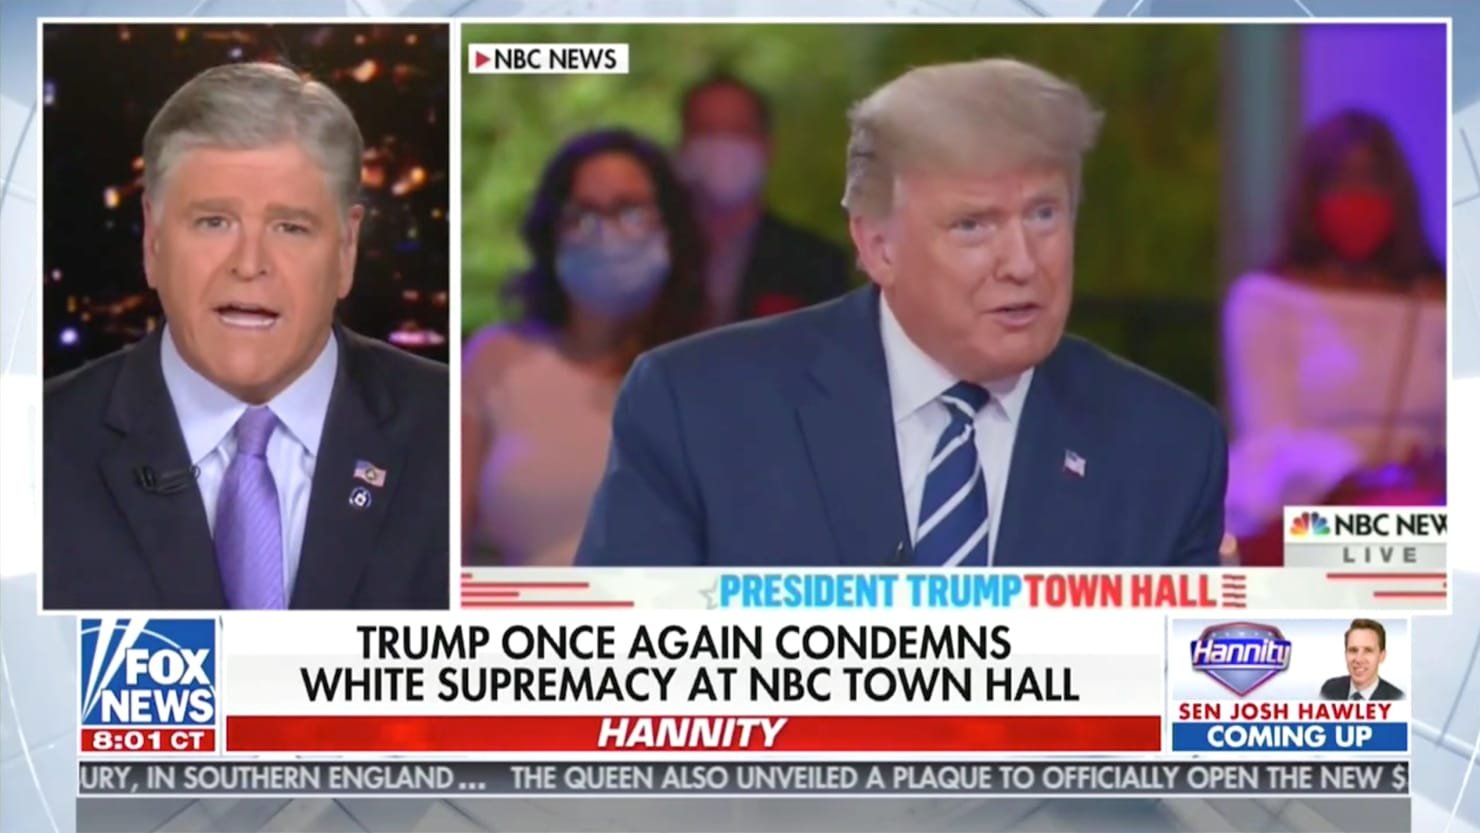 Fox News Stars Horrified by Savannah Guthrie's Trump 'Ambush'